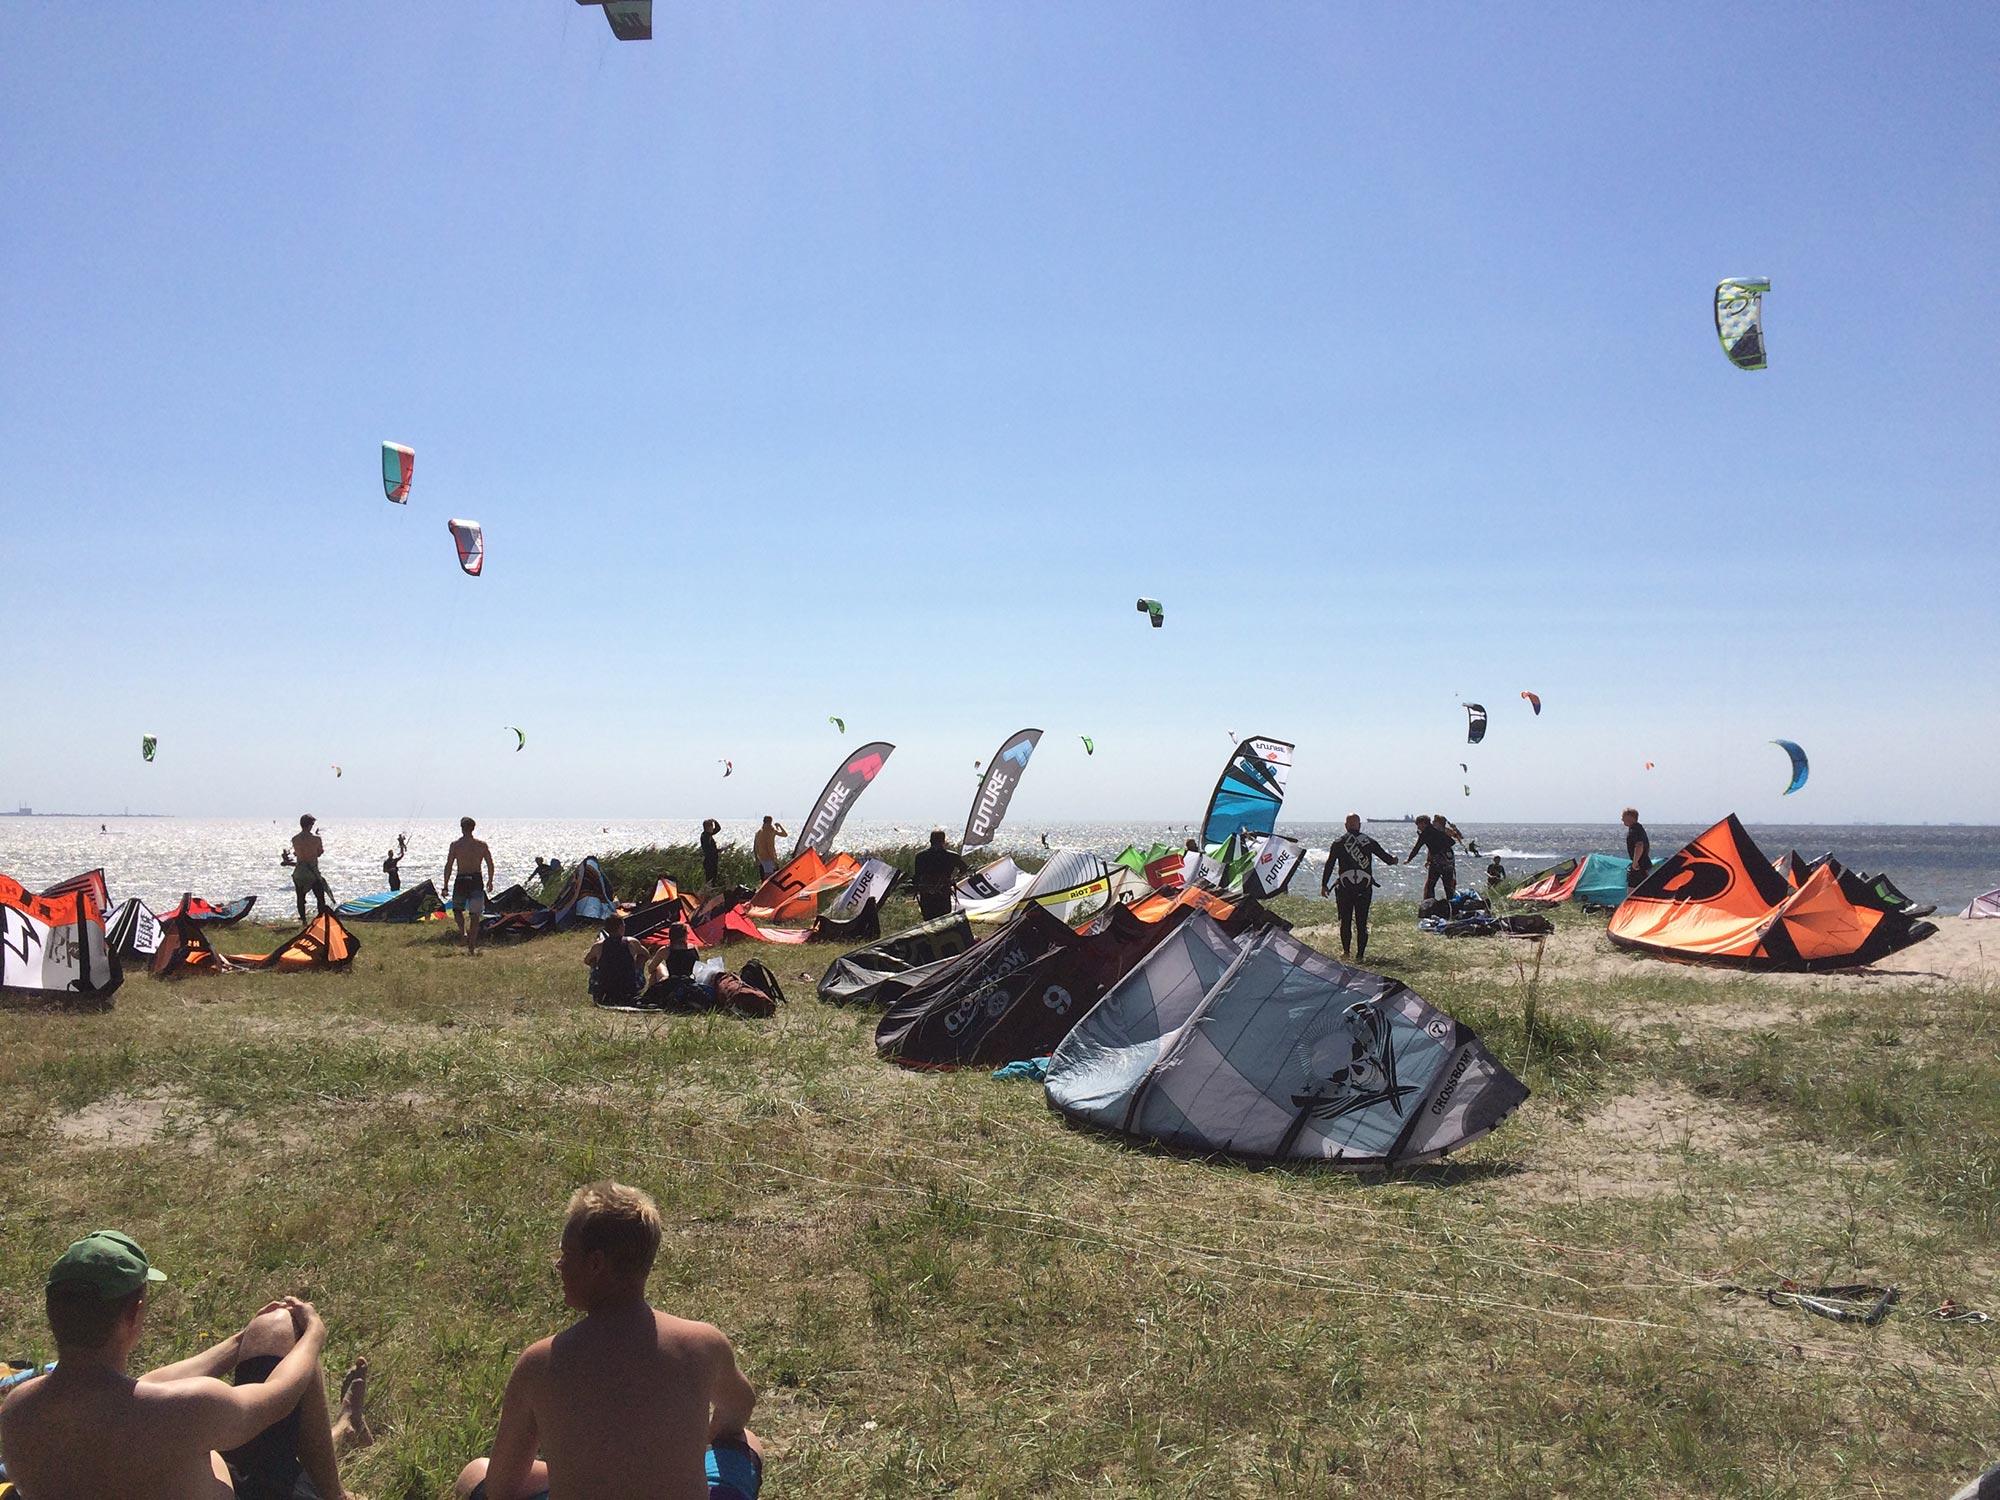 Lundåkra kitespot